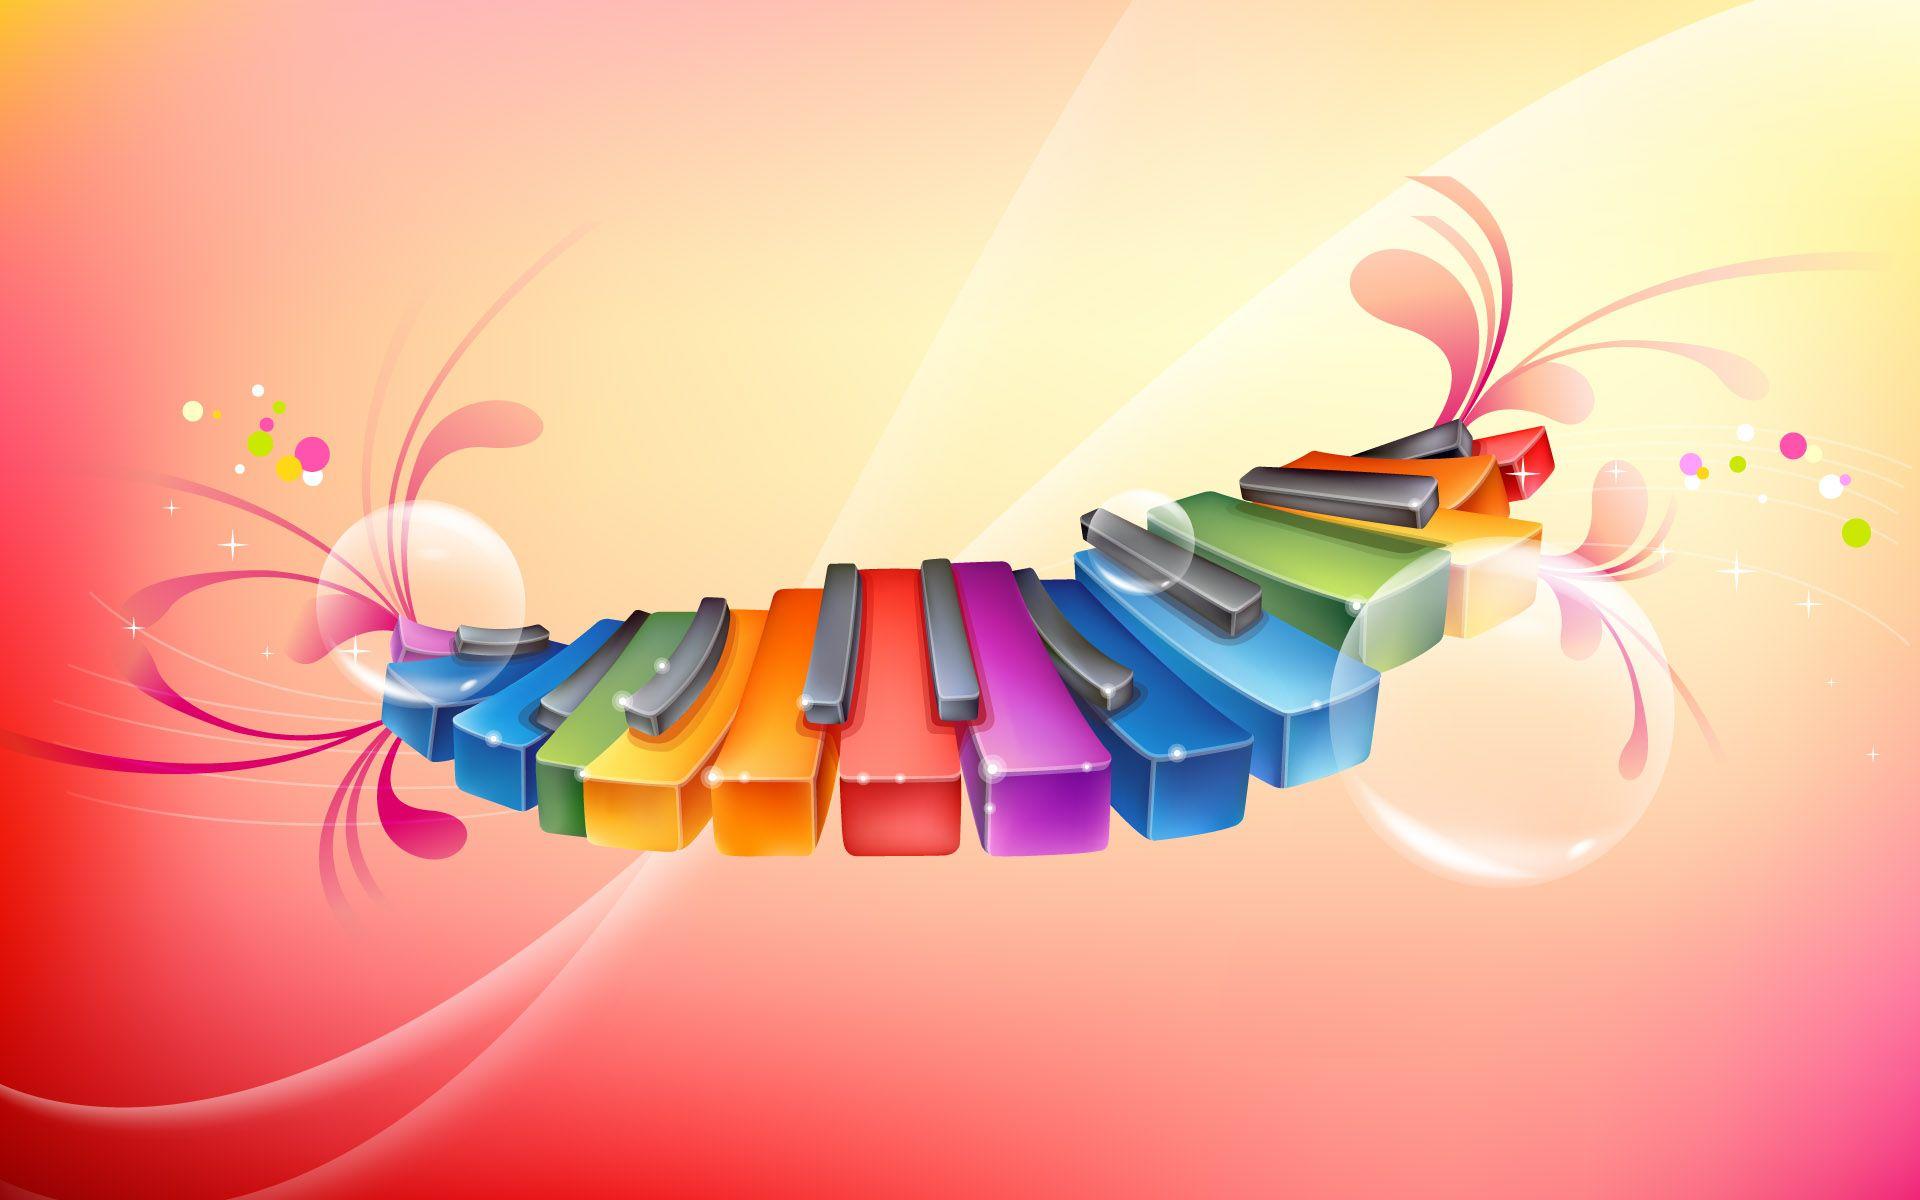 Colorful Piano Creative Graphics Creative Desktop Wallpaper Colorful Backgrounds